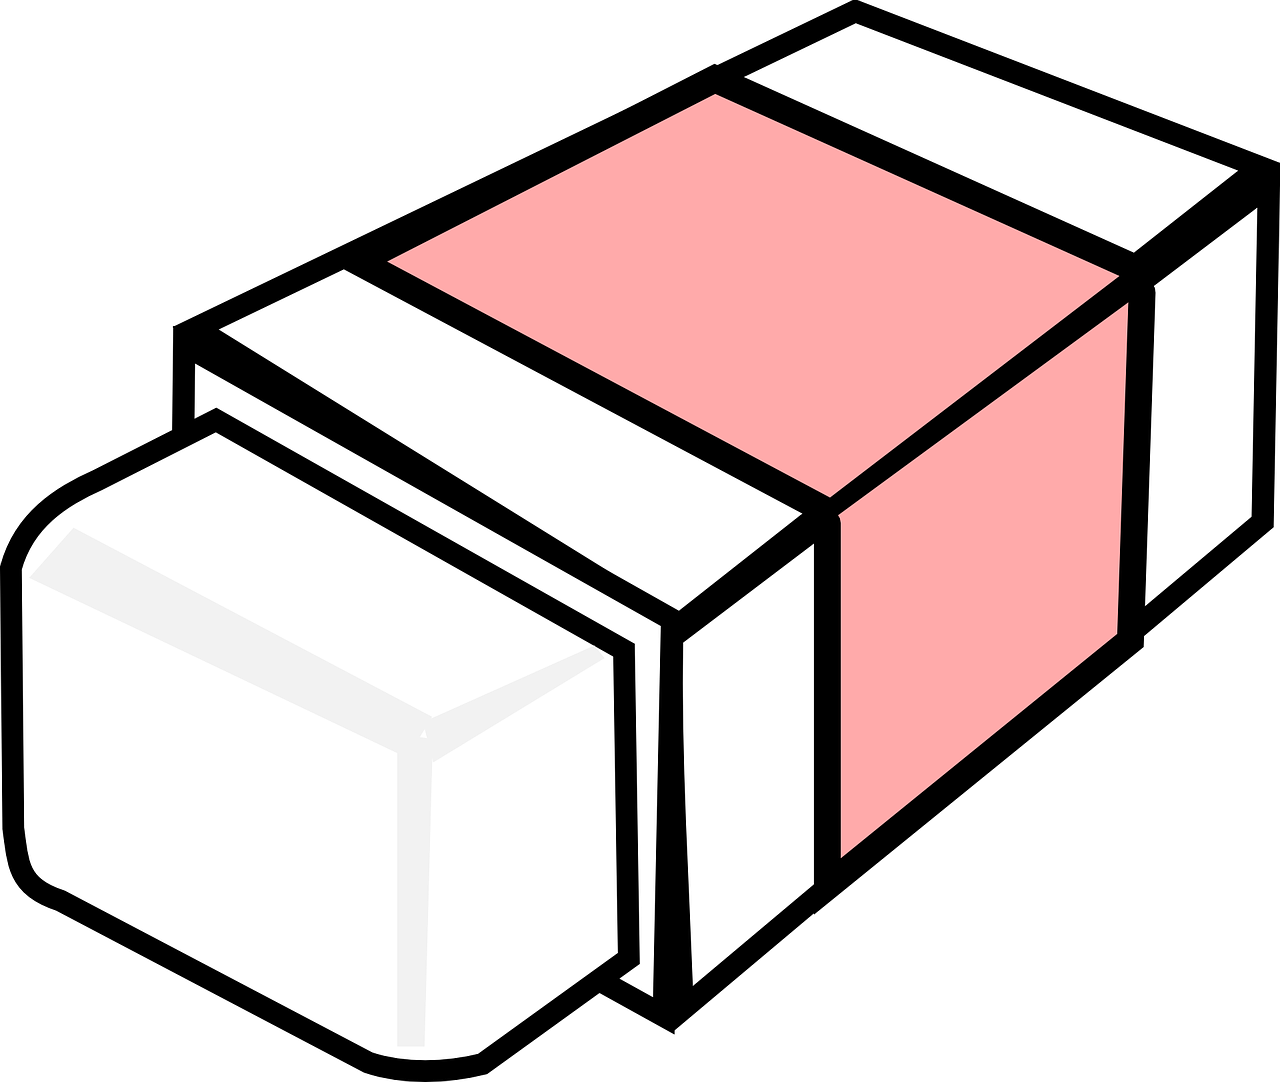 Hd free unlimited download. Eraser clipart big pink